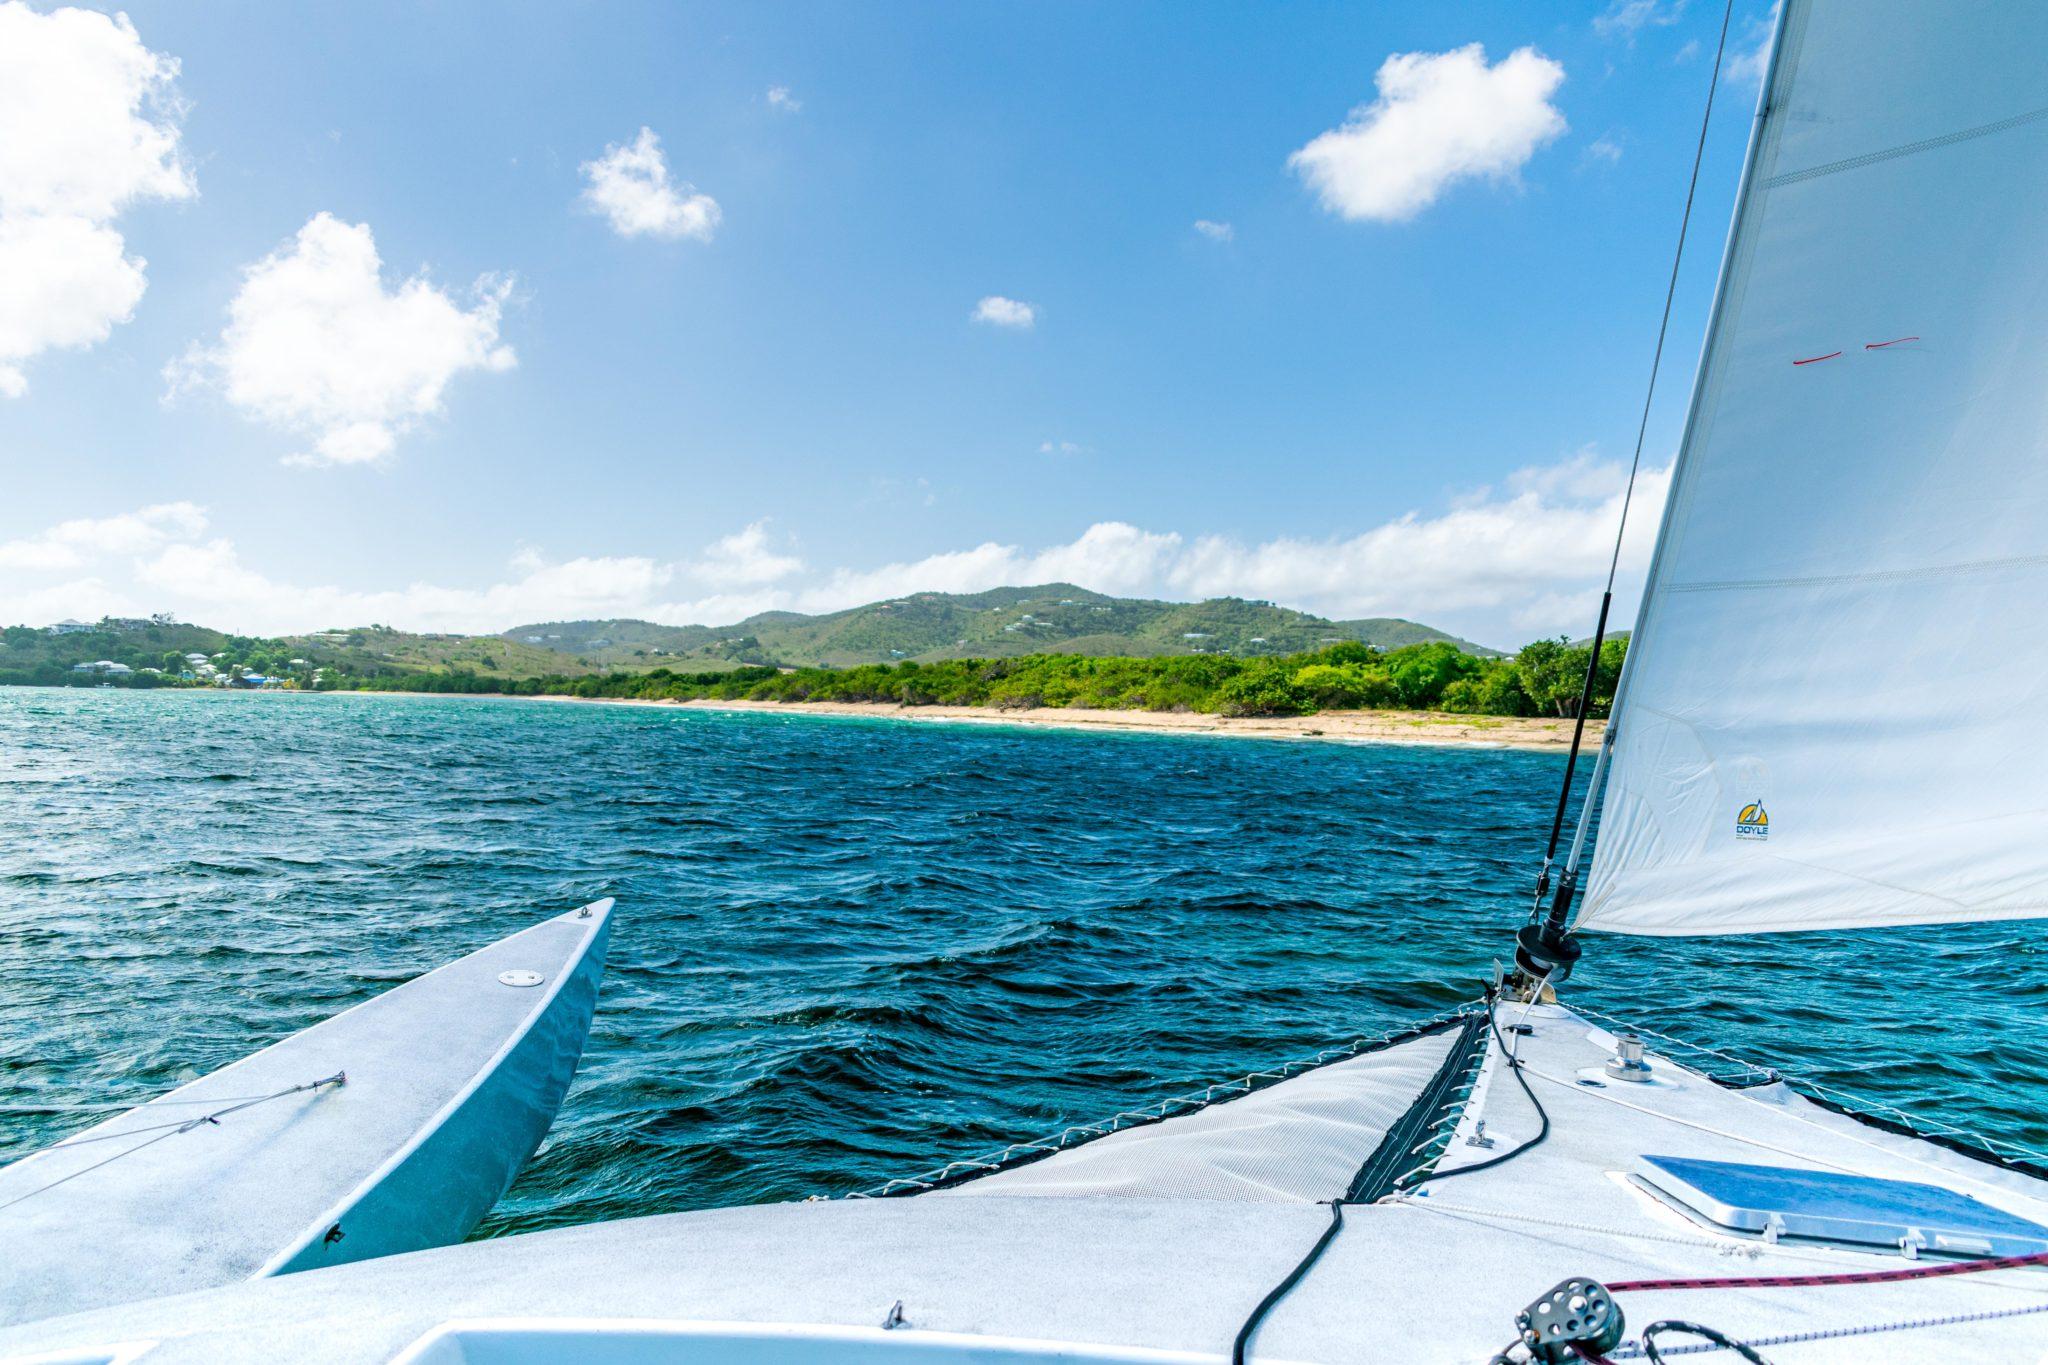 Pining for Prune Bay Breezy Beach Fun in St. Croix